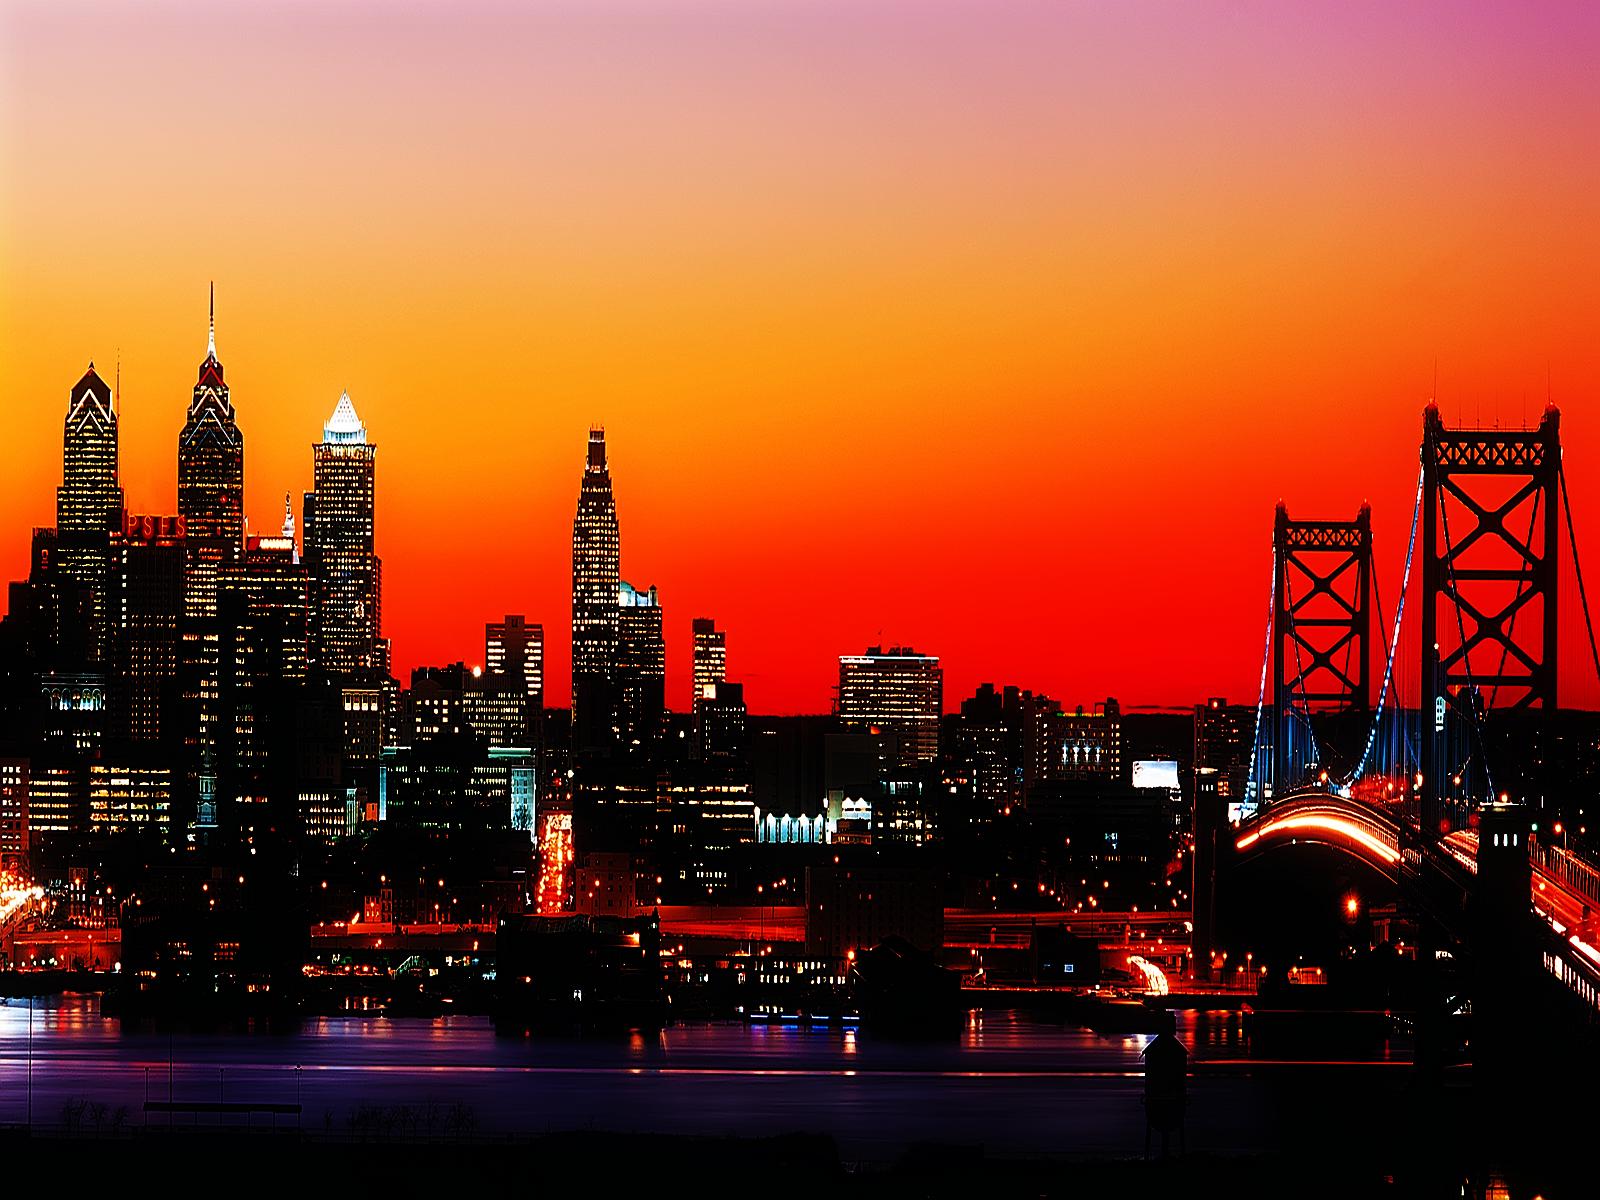 Philadelphia City Skyline wallpaper The Plutocracy is Good 1600x1200